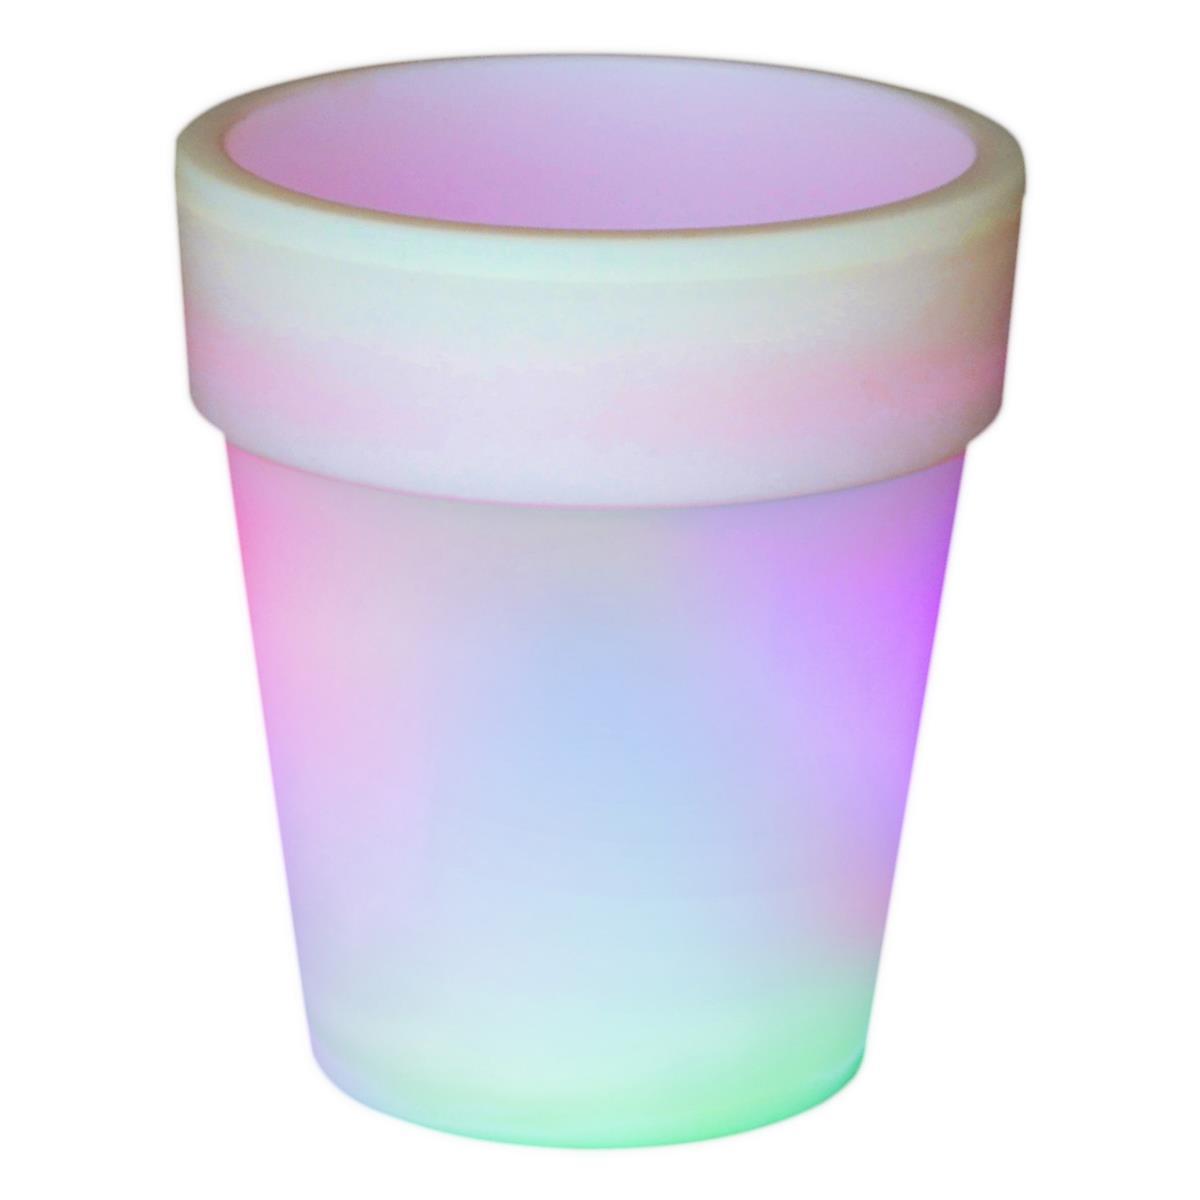 LED Solar Blumentopf weiß 3 LED mit Farbwechsel 19x17 cm Pflanzkübel